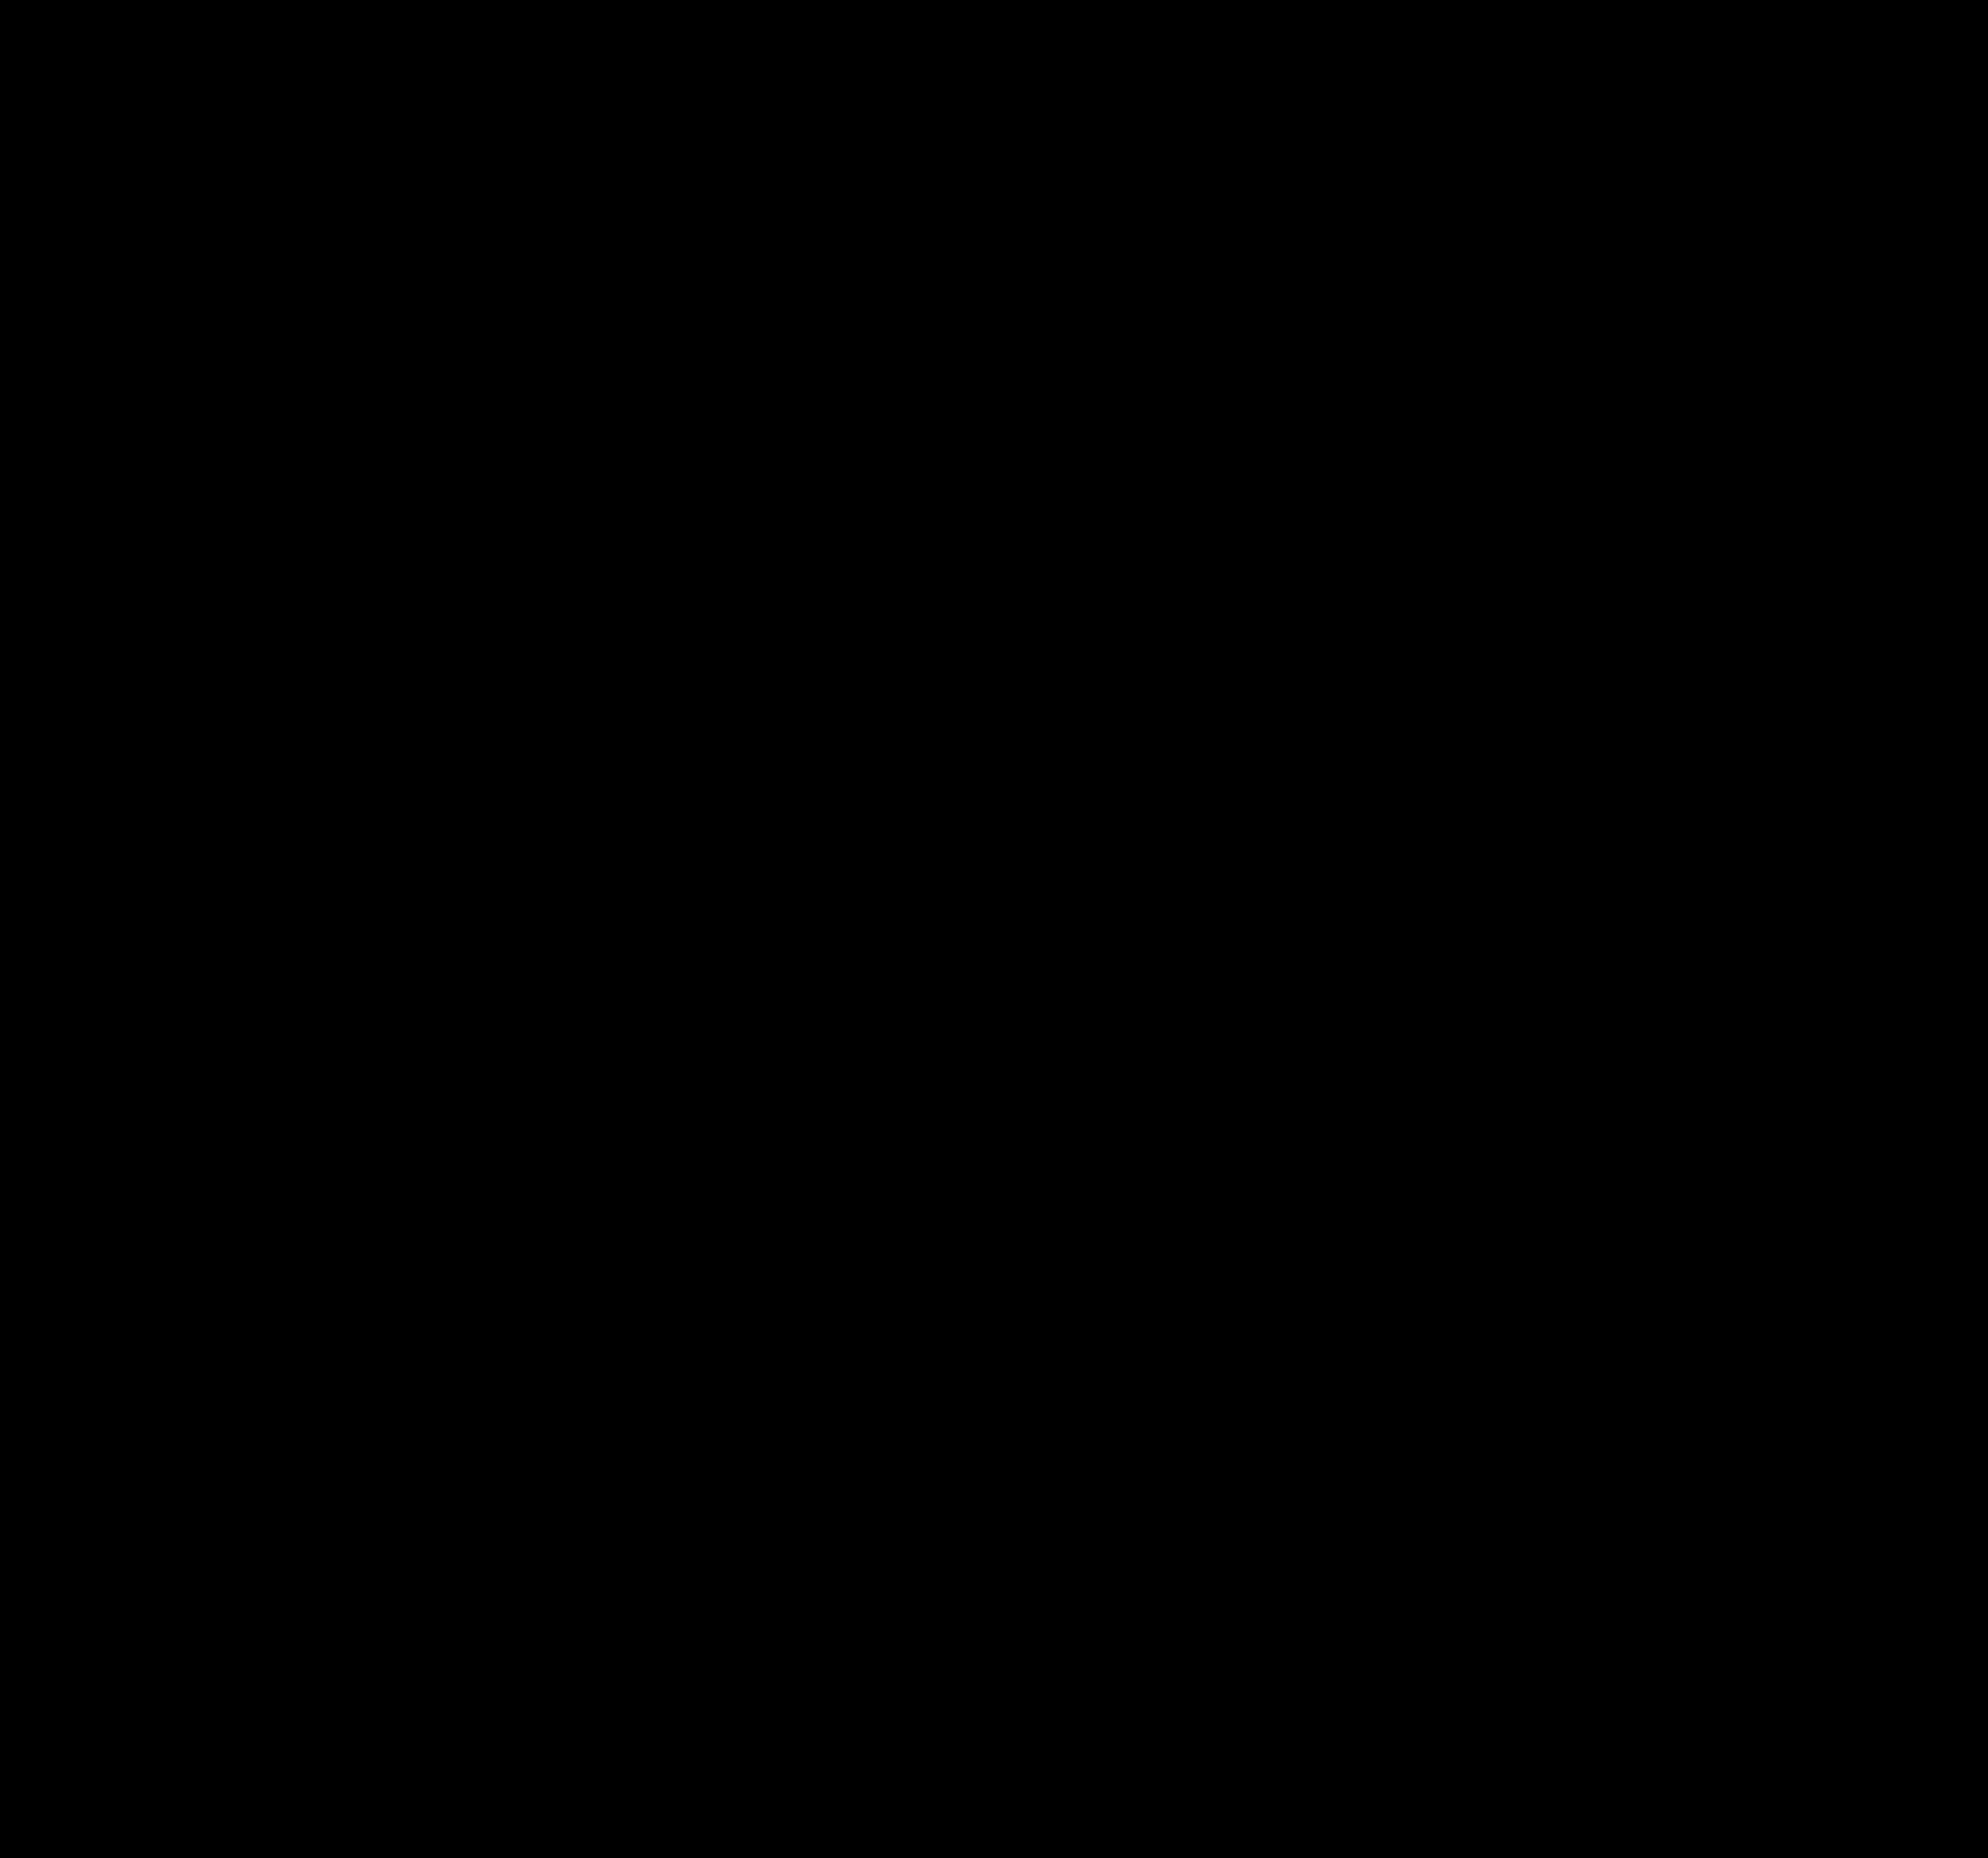 Simboli arti marziali